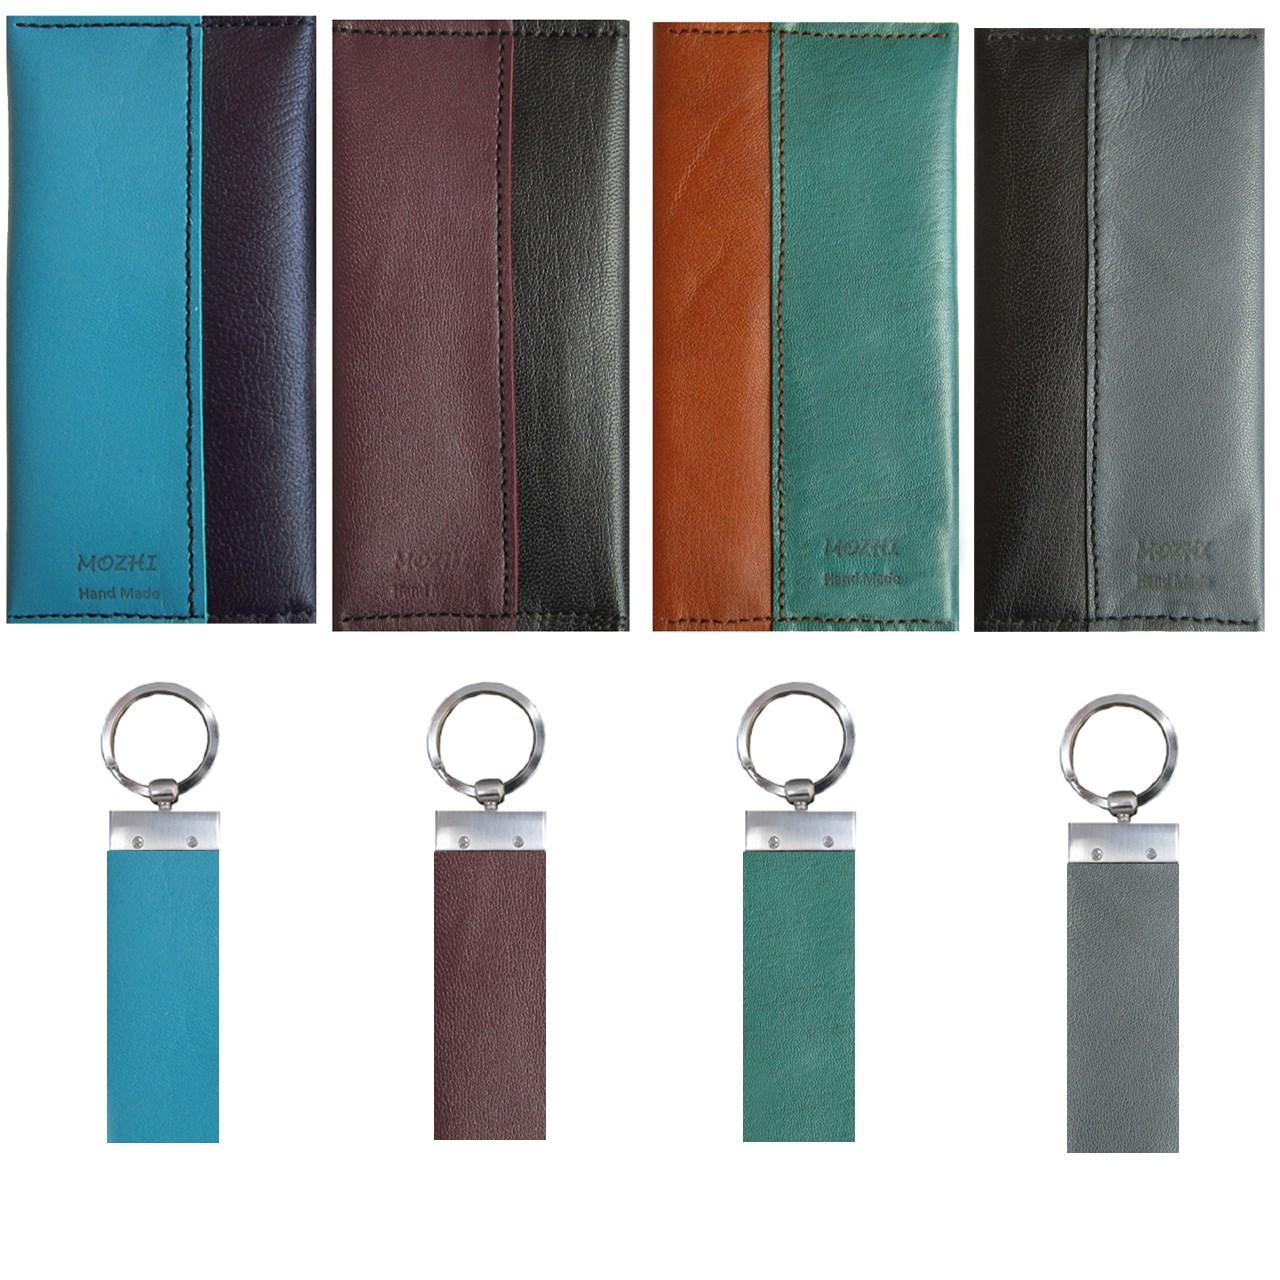 کیف پول چرم طبیعی دستدوز مژی مدل T